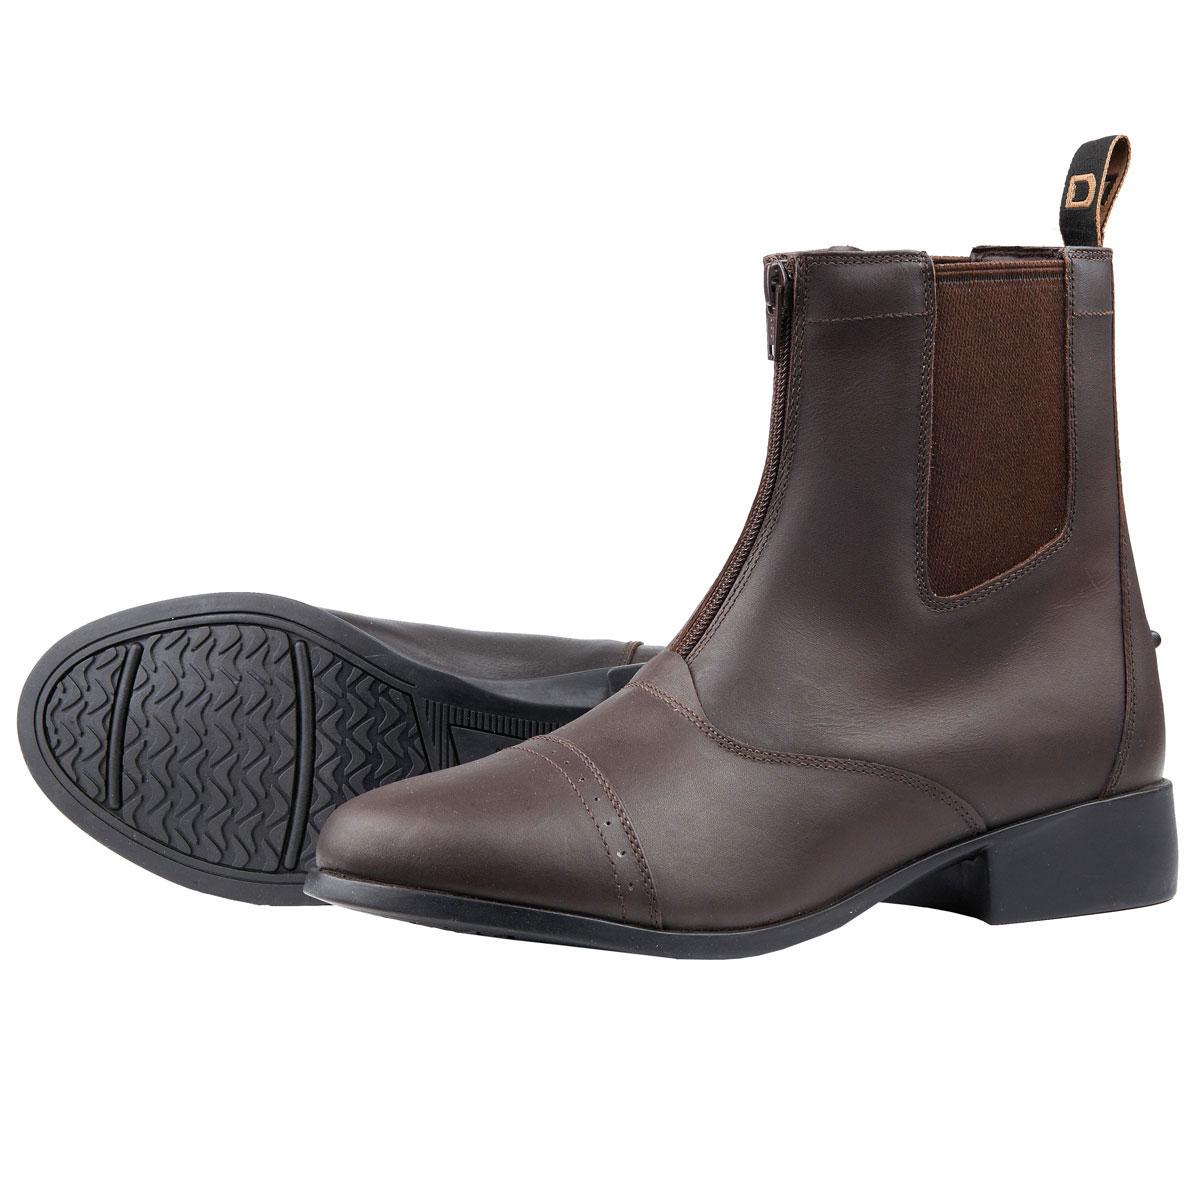 Dublin Elevation Zip Front Paddock Boots